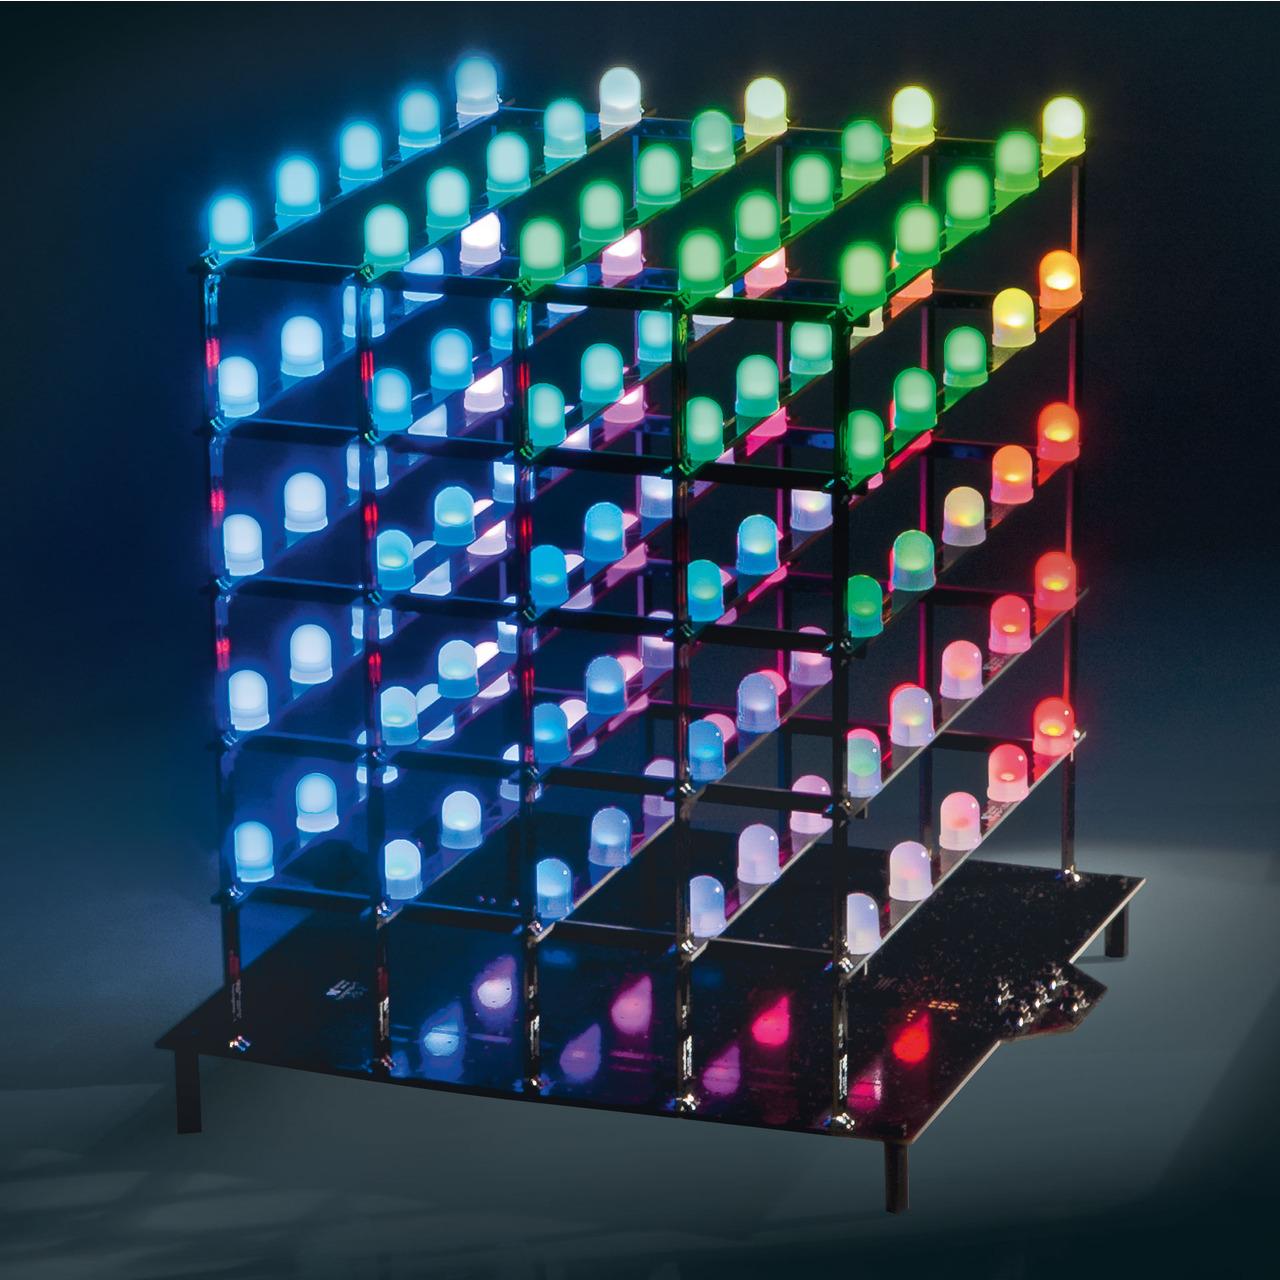 ELV Bausatz 5x5x5-RGB-Cube RGBC555- ohne LEDs